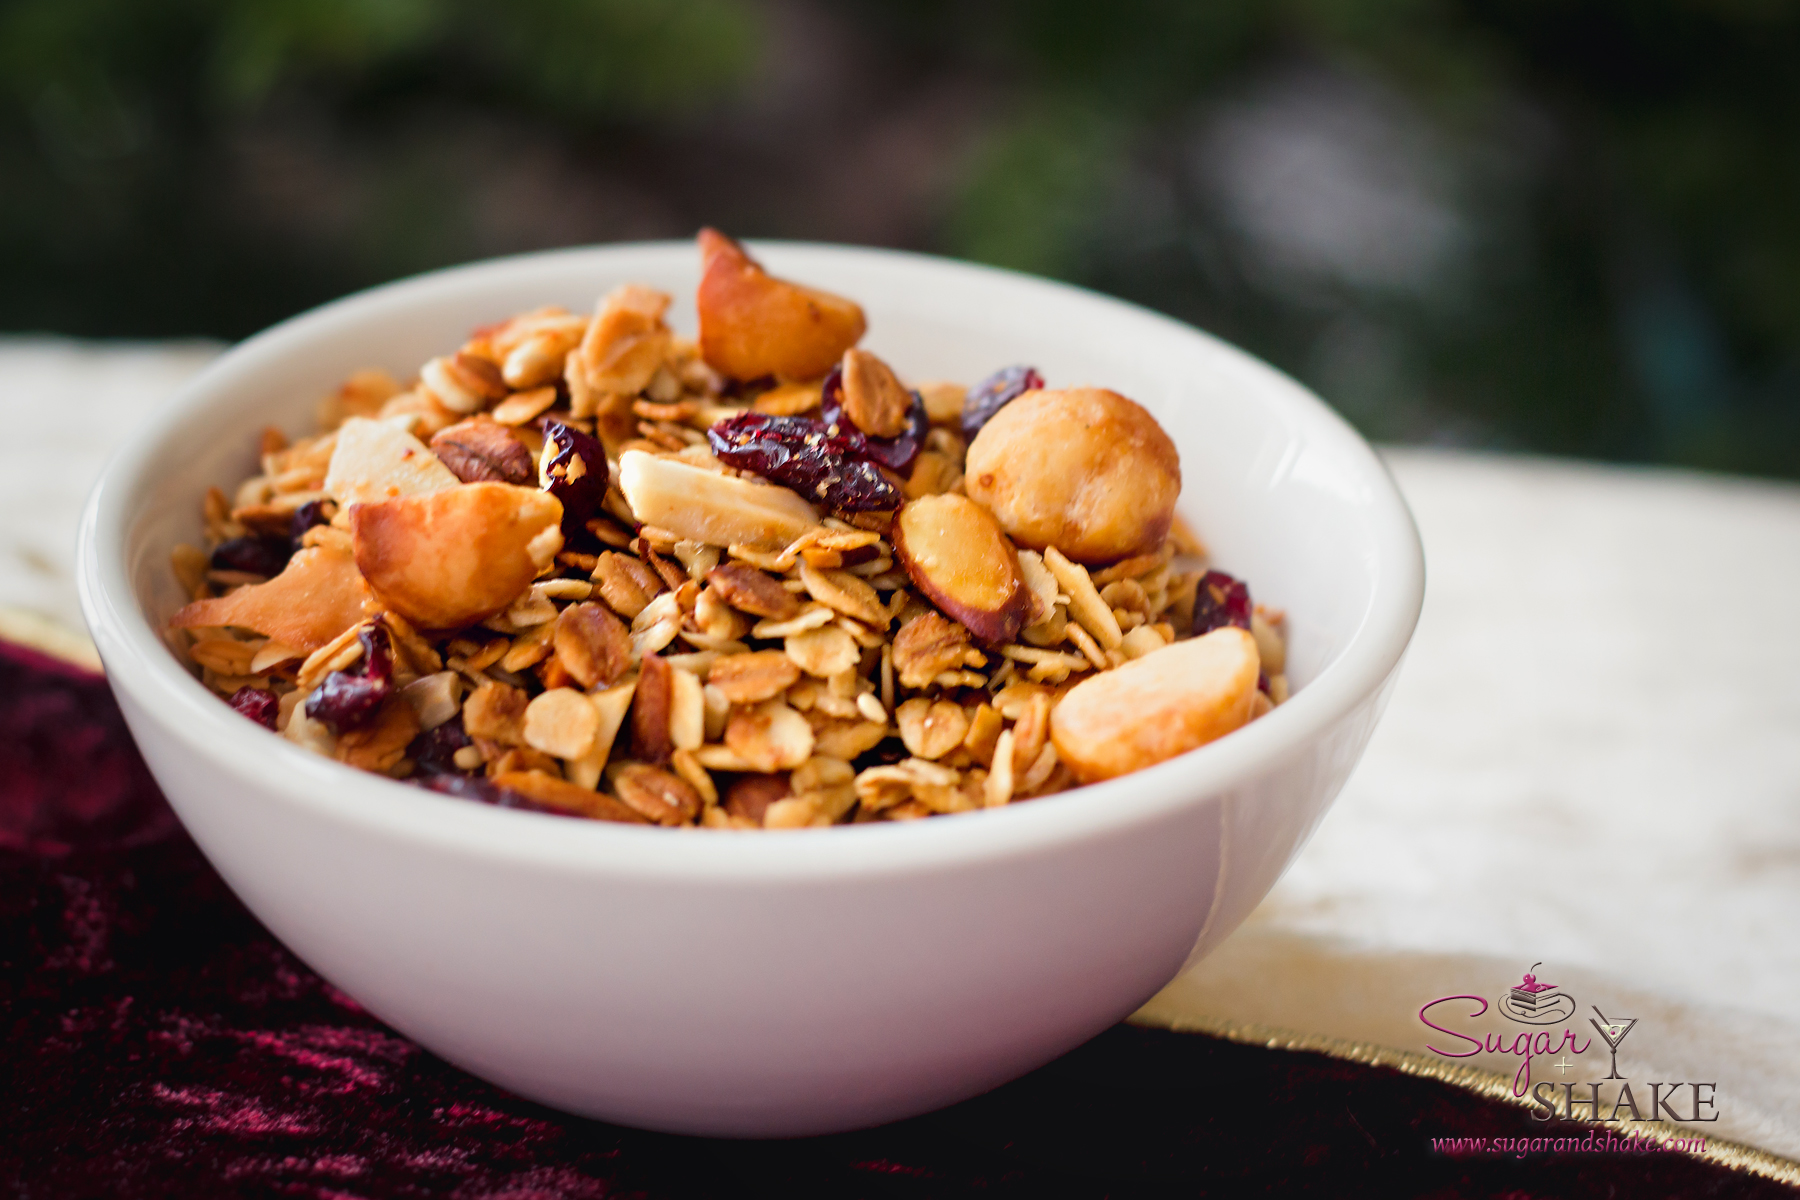 Shake's Cranberry Mac Nut Crunch Granola. © 2012 Sugar + Shake